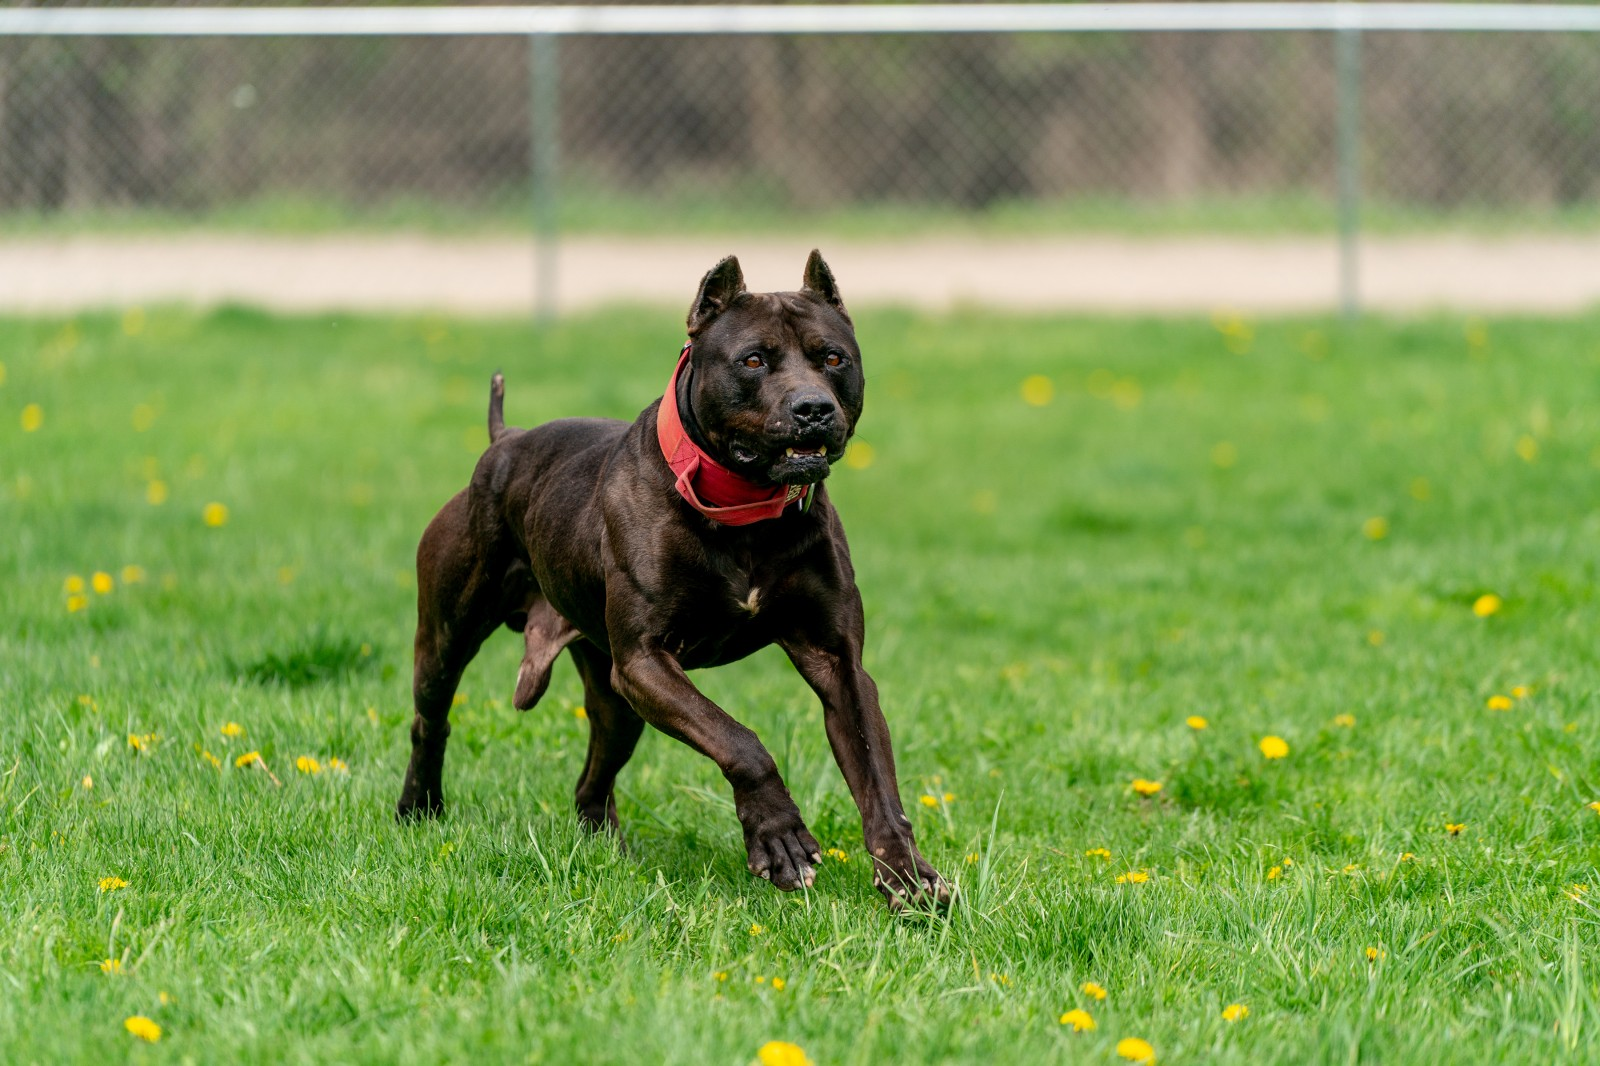 Unleashed Kennelz stud, black XL pit bull Batman runs through a field of green grass and dandelions wearing a red collar.